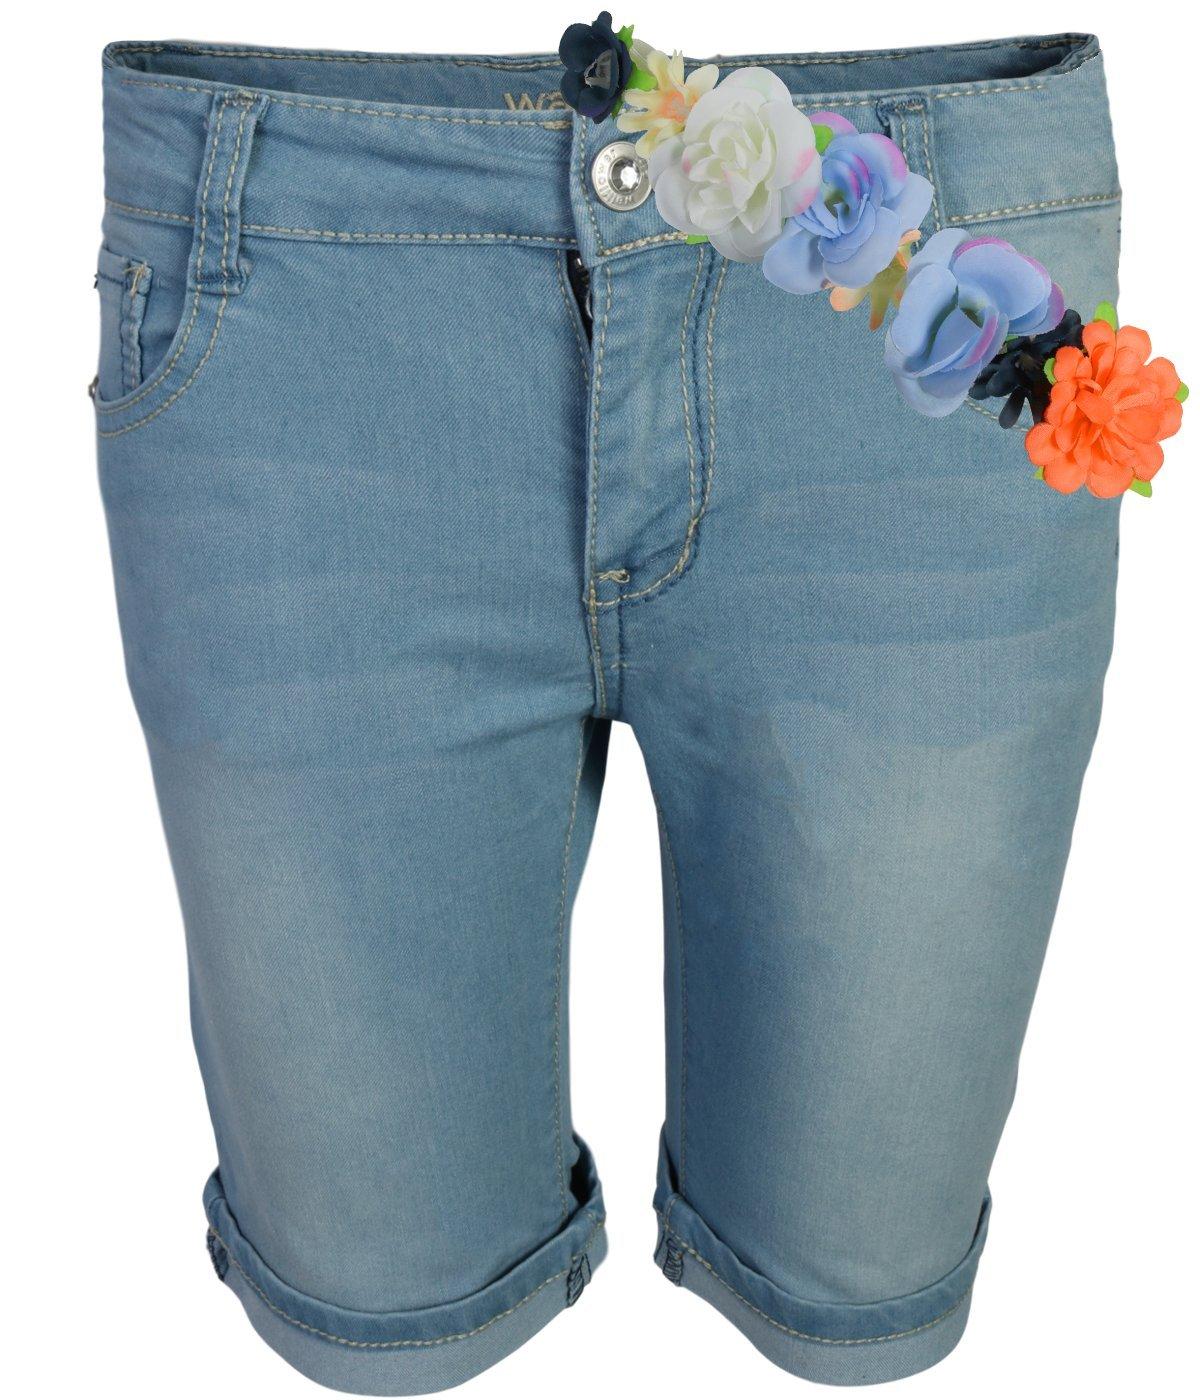 WallFlower Girls Bermuda Soft Stretch Denim Shorts, Light Wash w/Headband, Size 10